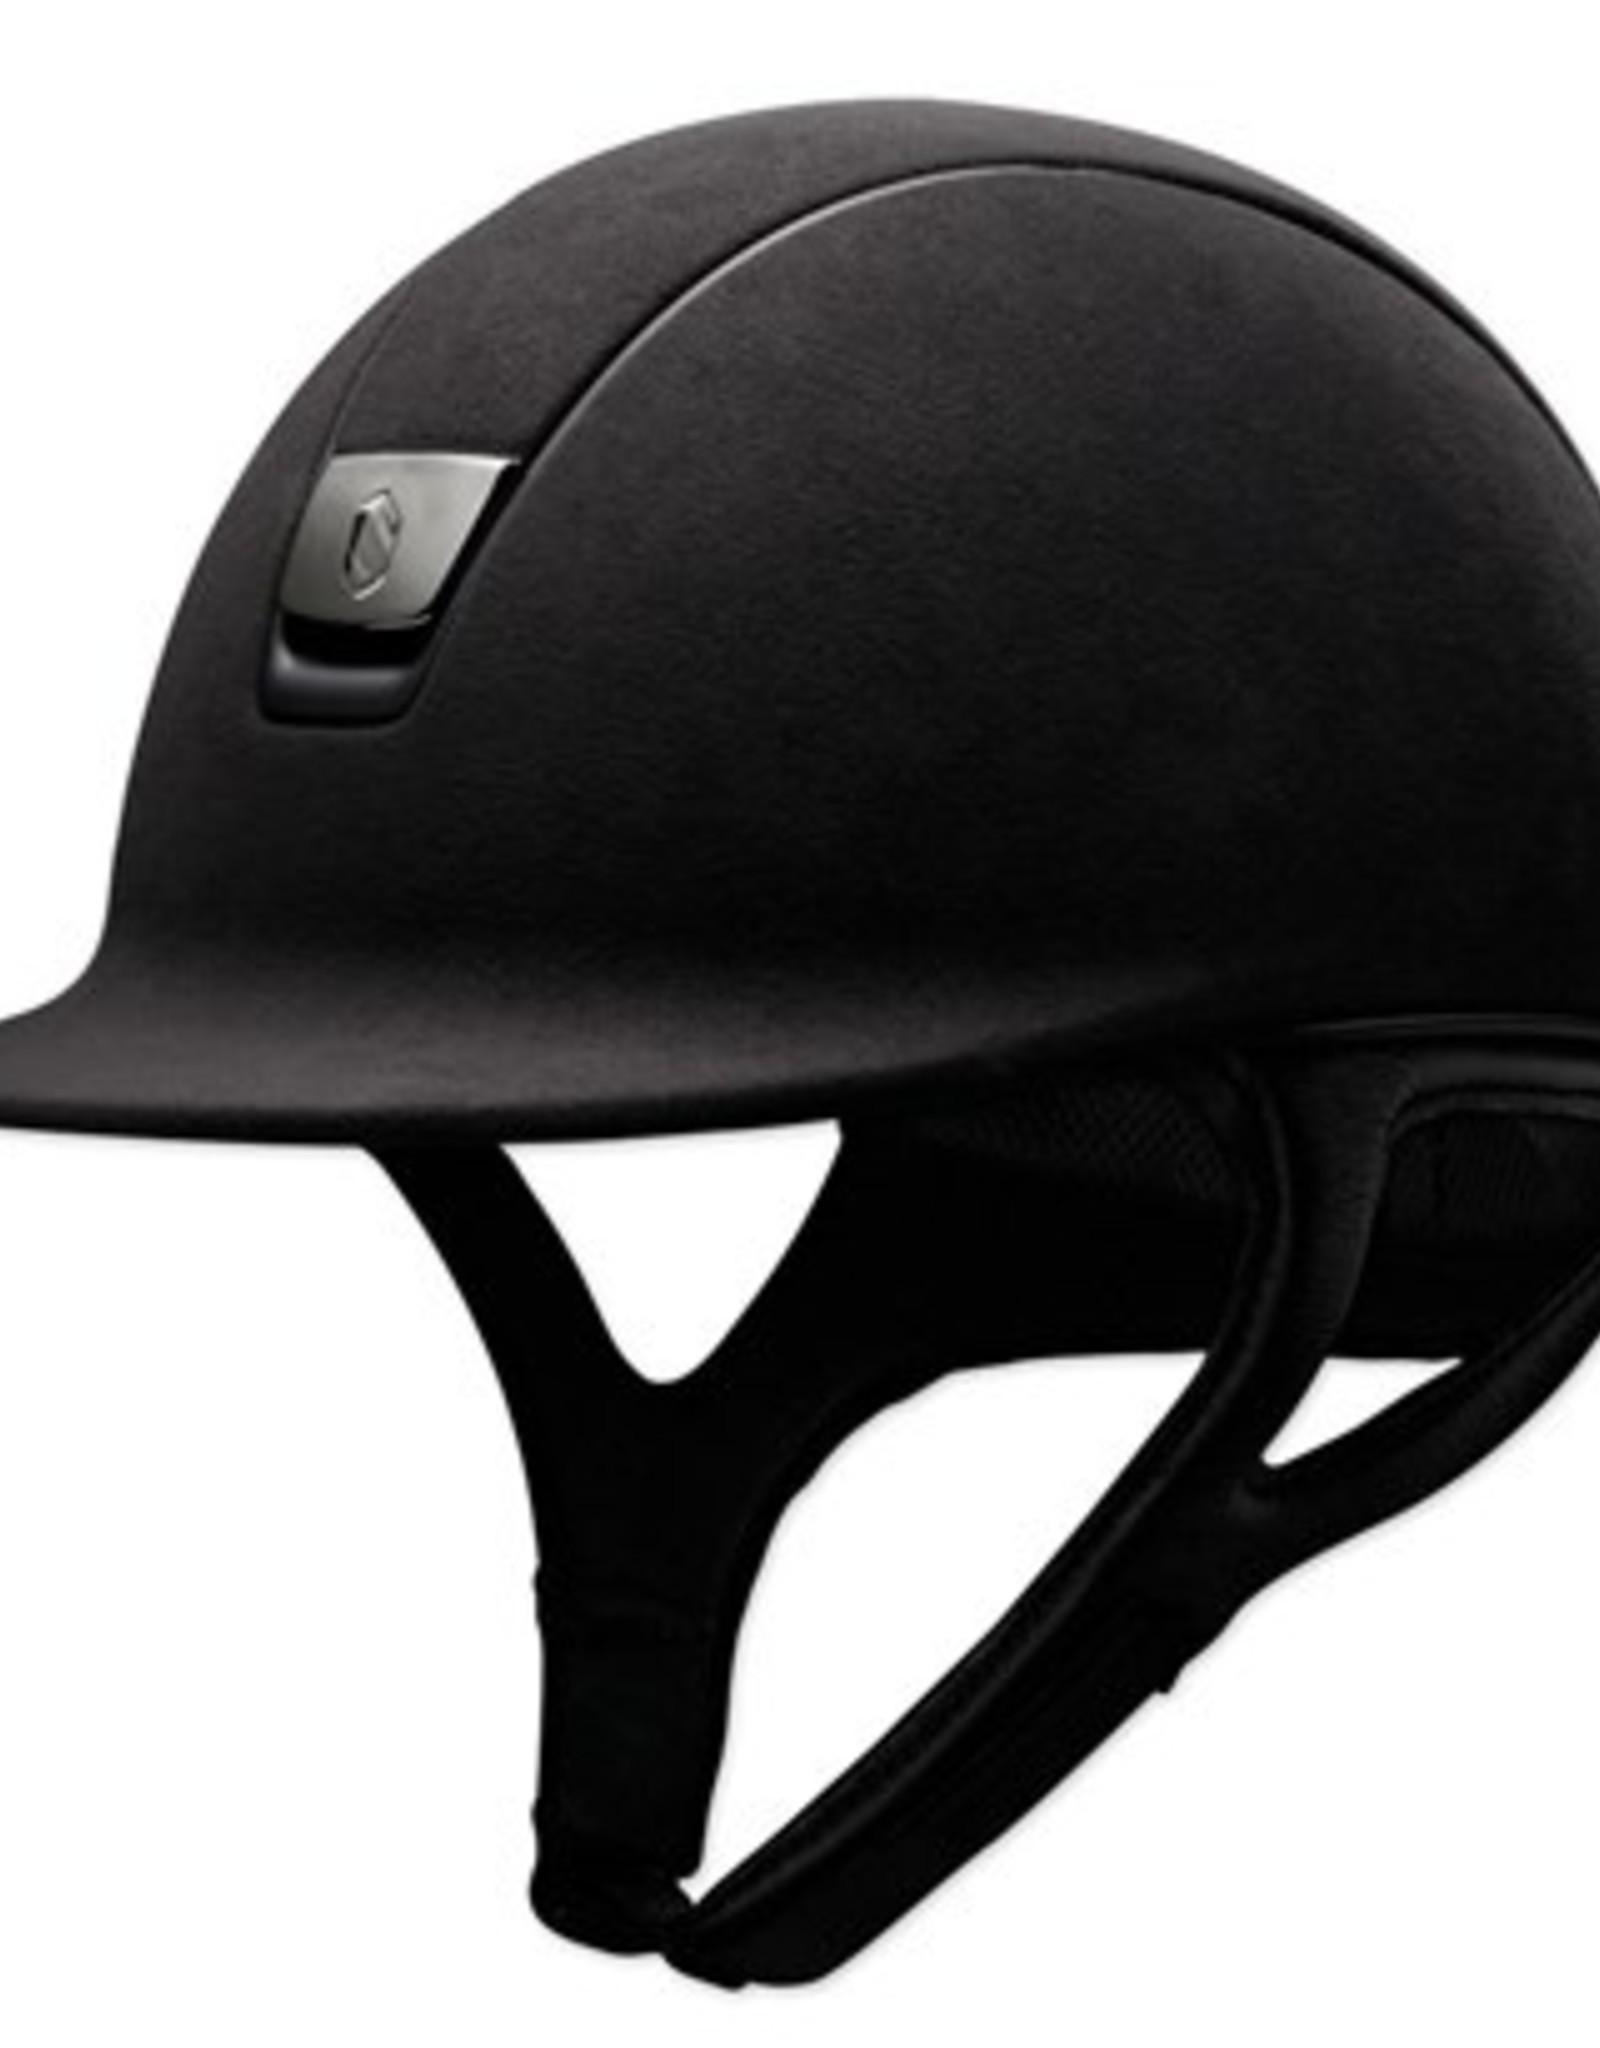 Samshield Premium Alcantara Helmet